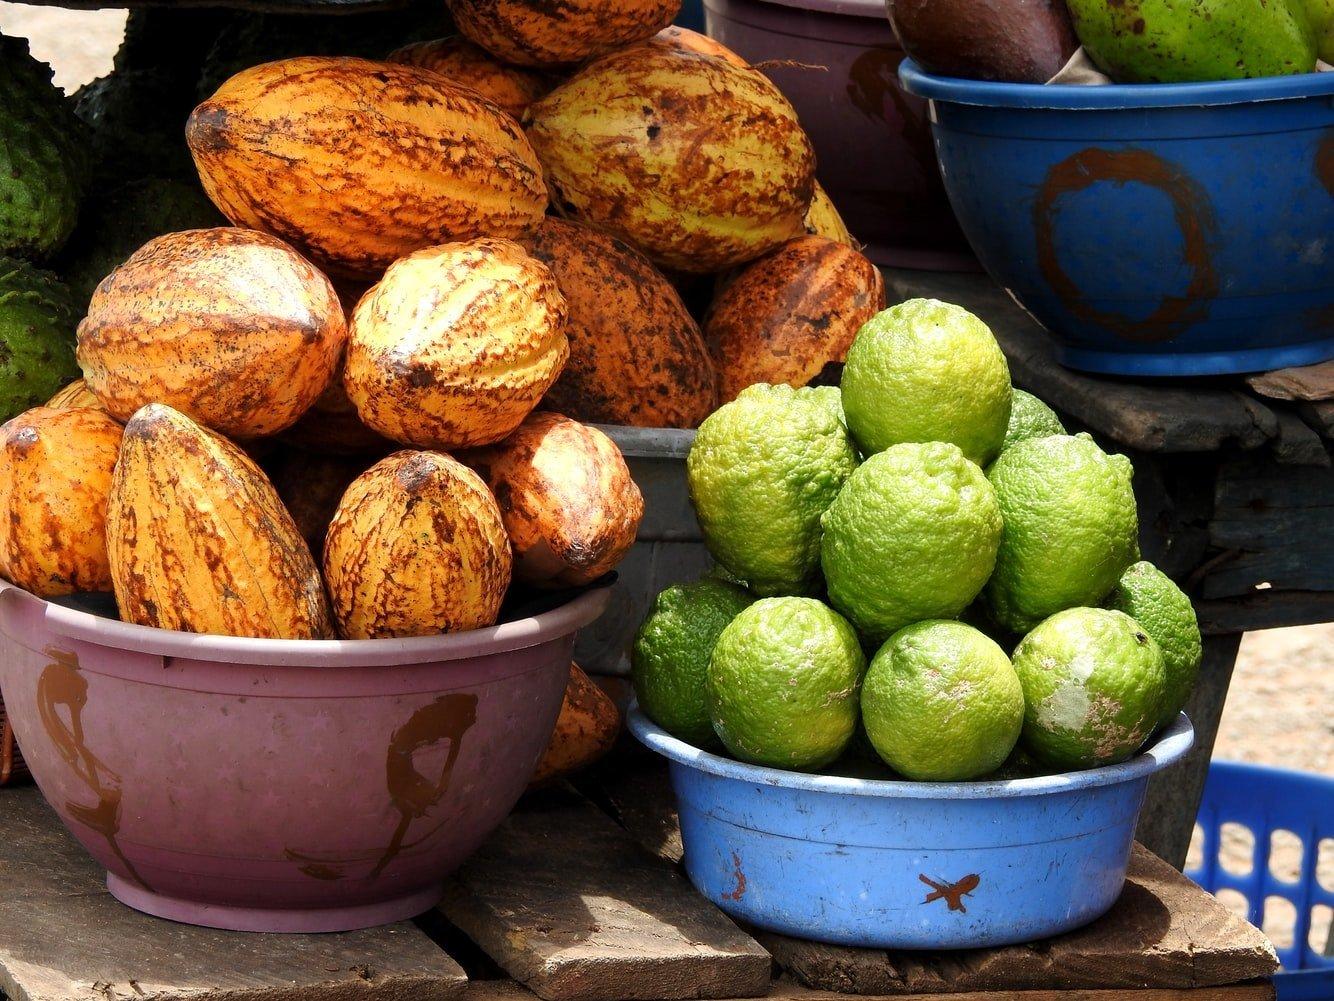 Kakao und Zitronen auf dem Kejetia Markt in Kumasi Ghana